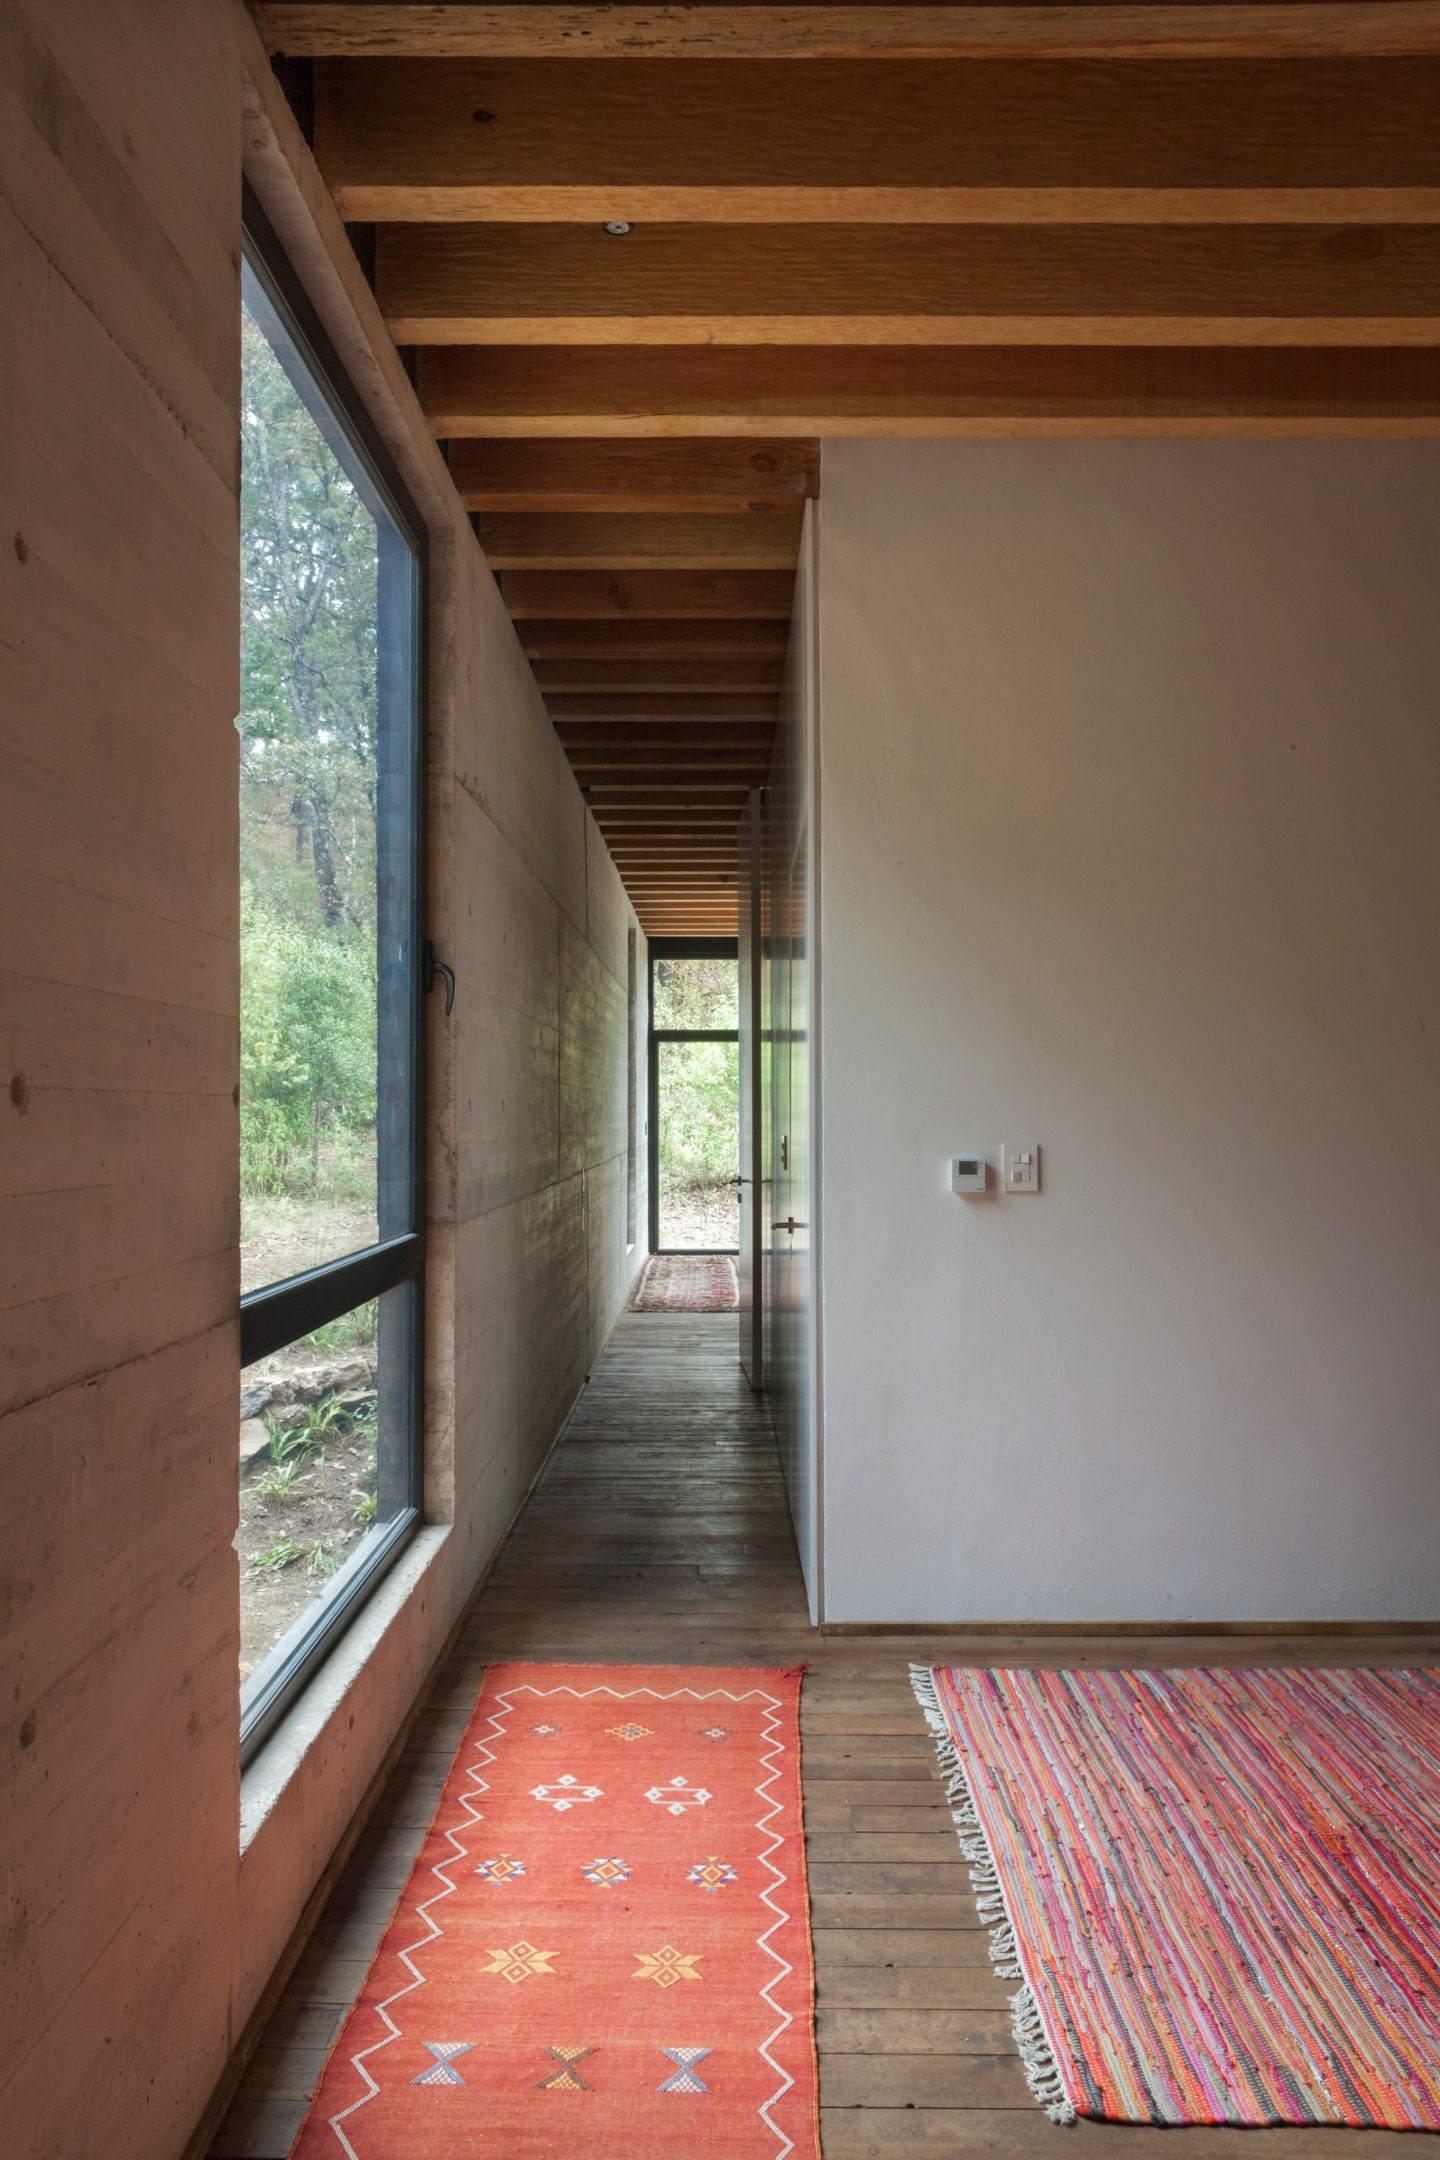 IGNANT-Architecture-Cadaval-Sola-Morales-Casa-De-La-Roca-14